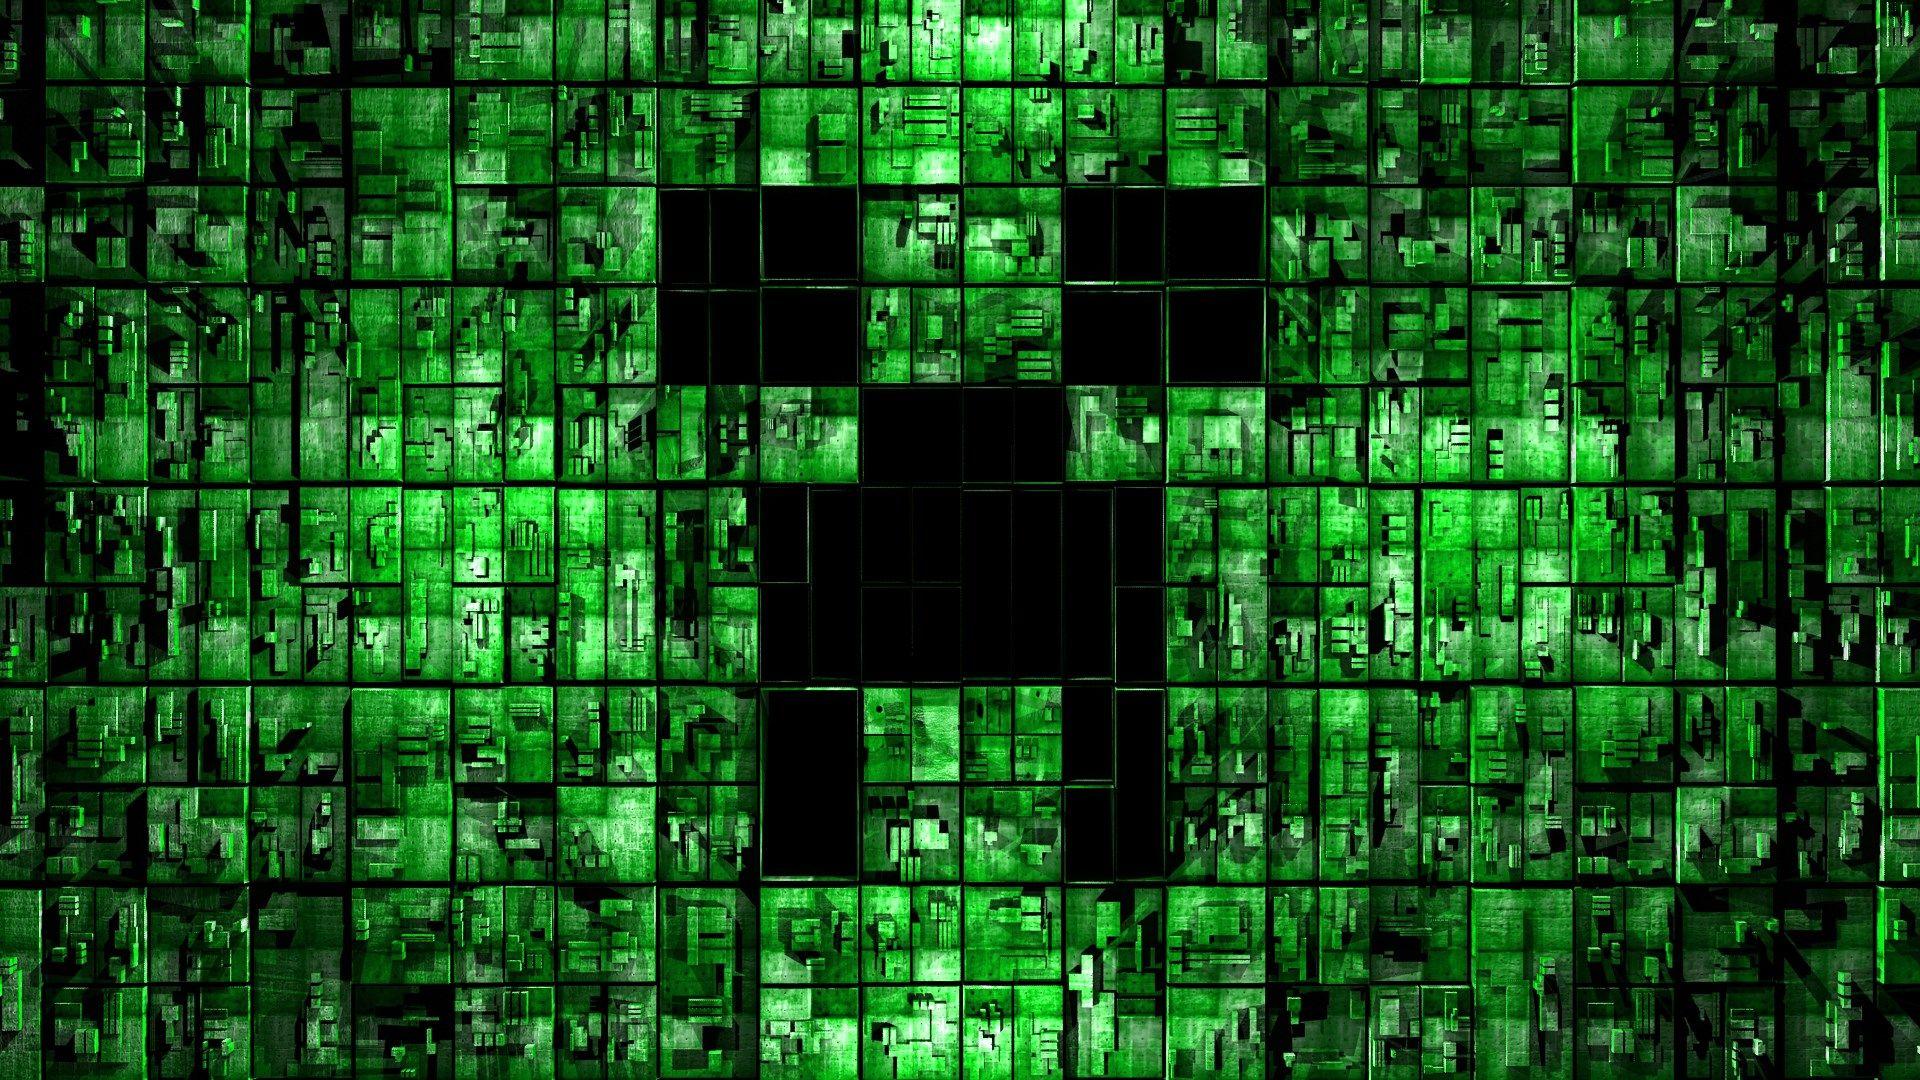 Great Wallpaper Minecraft Google - 7e6085d5ca4648d31cdb2f050682880c  Collection_434891.jpg